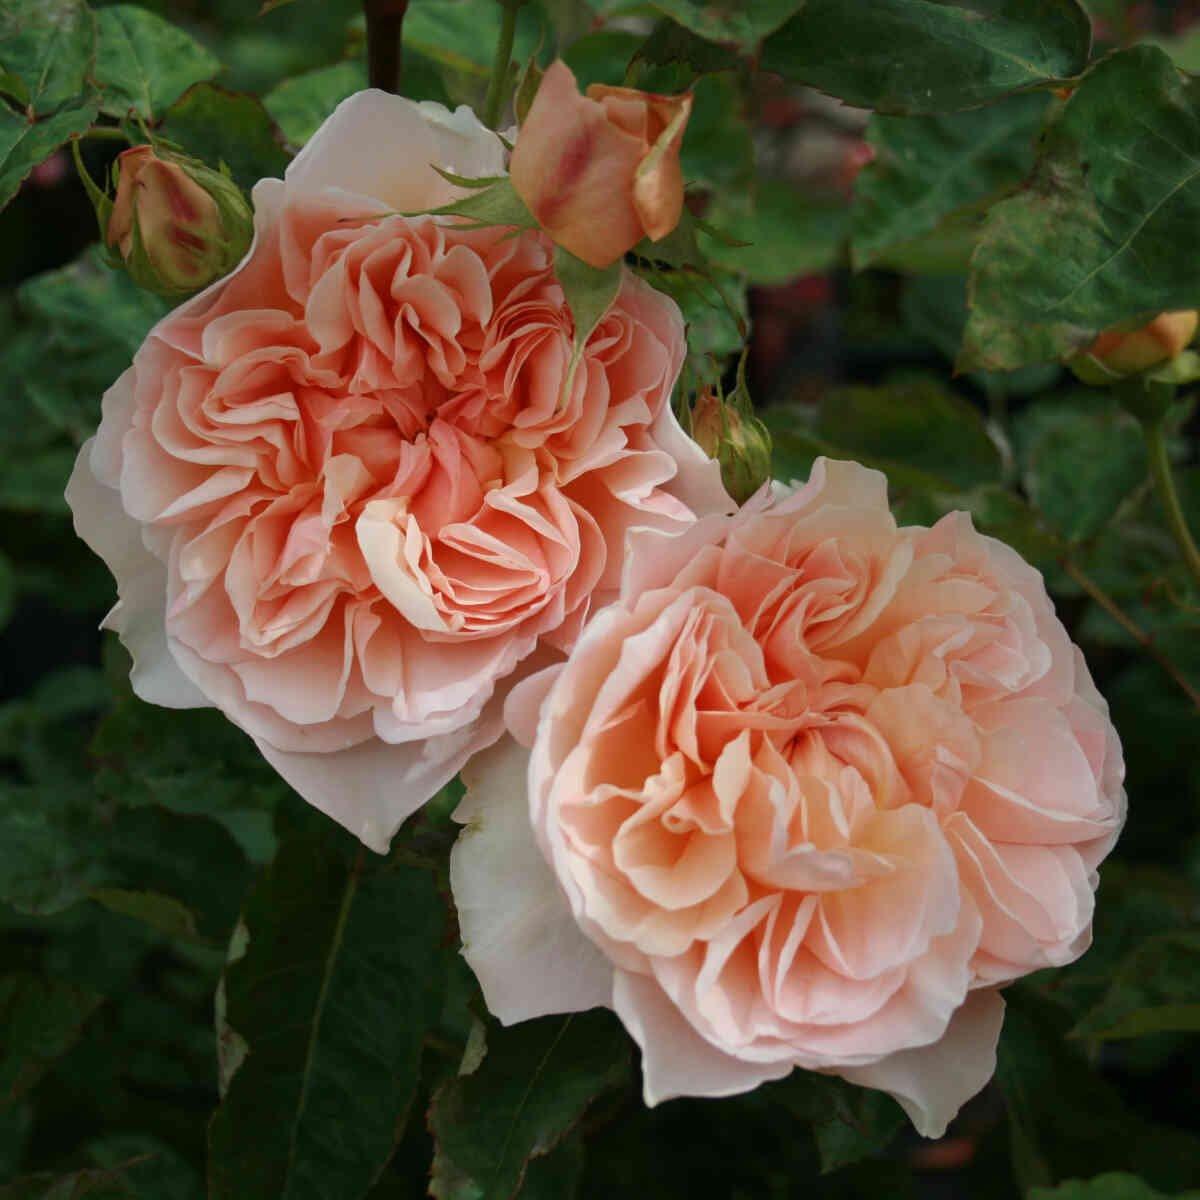 Rose 'Evelyn'